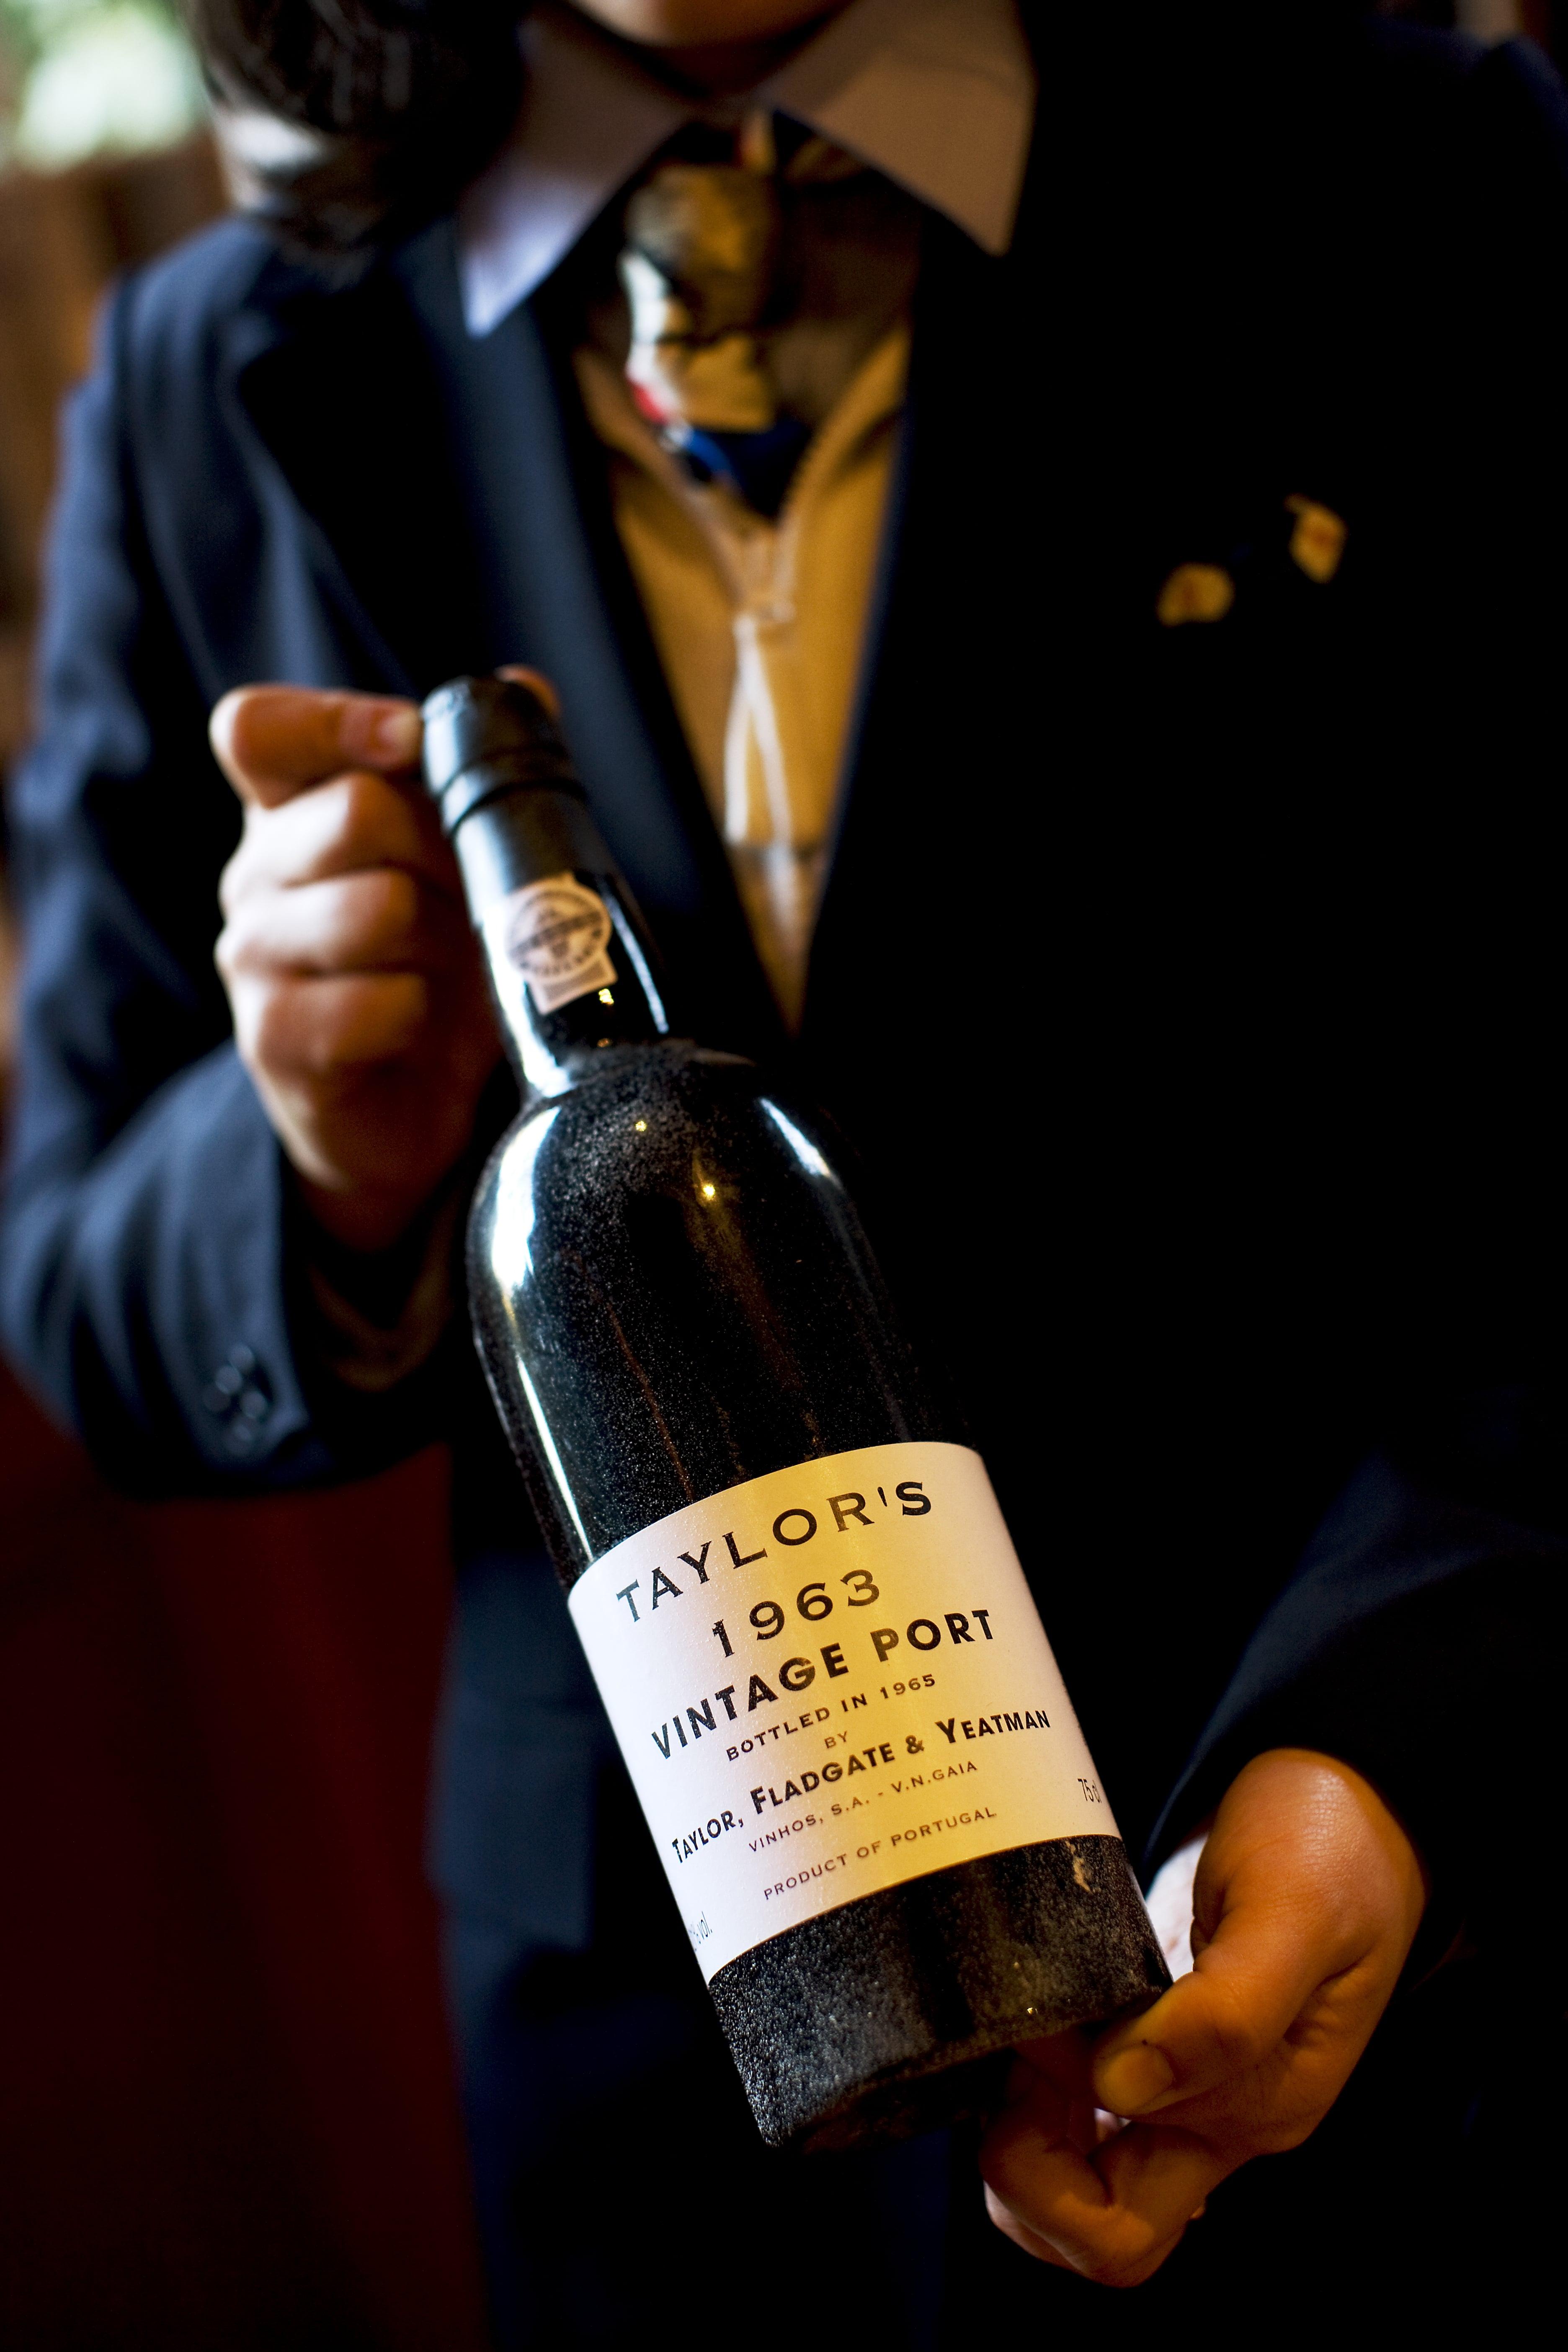 Caves Taylor's – Visit & Connoisseur Wine Tasting